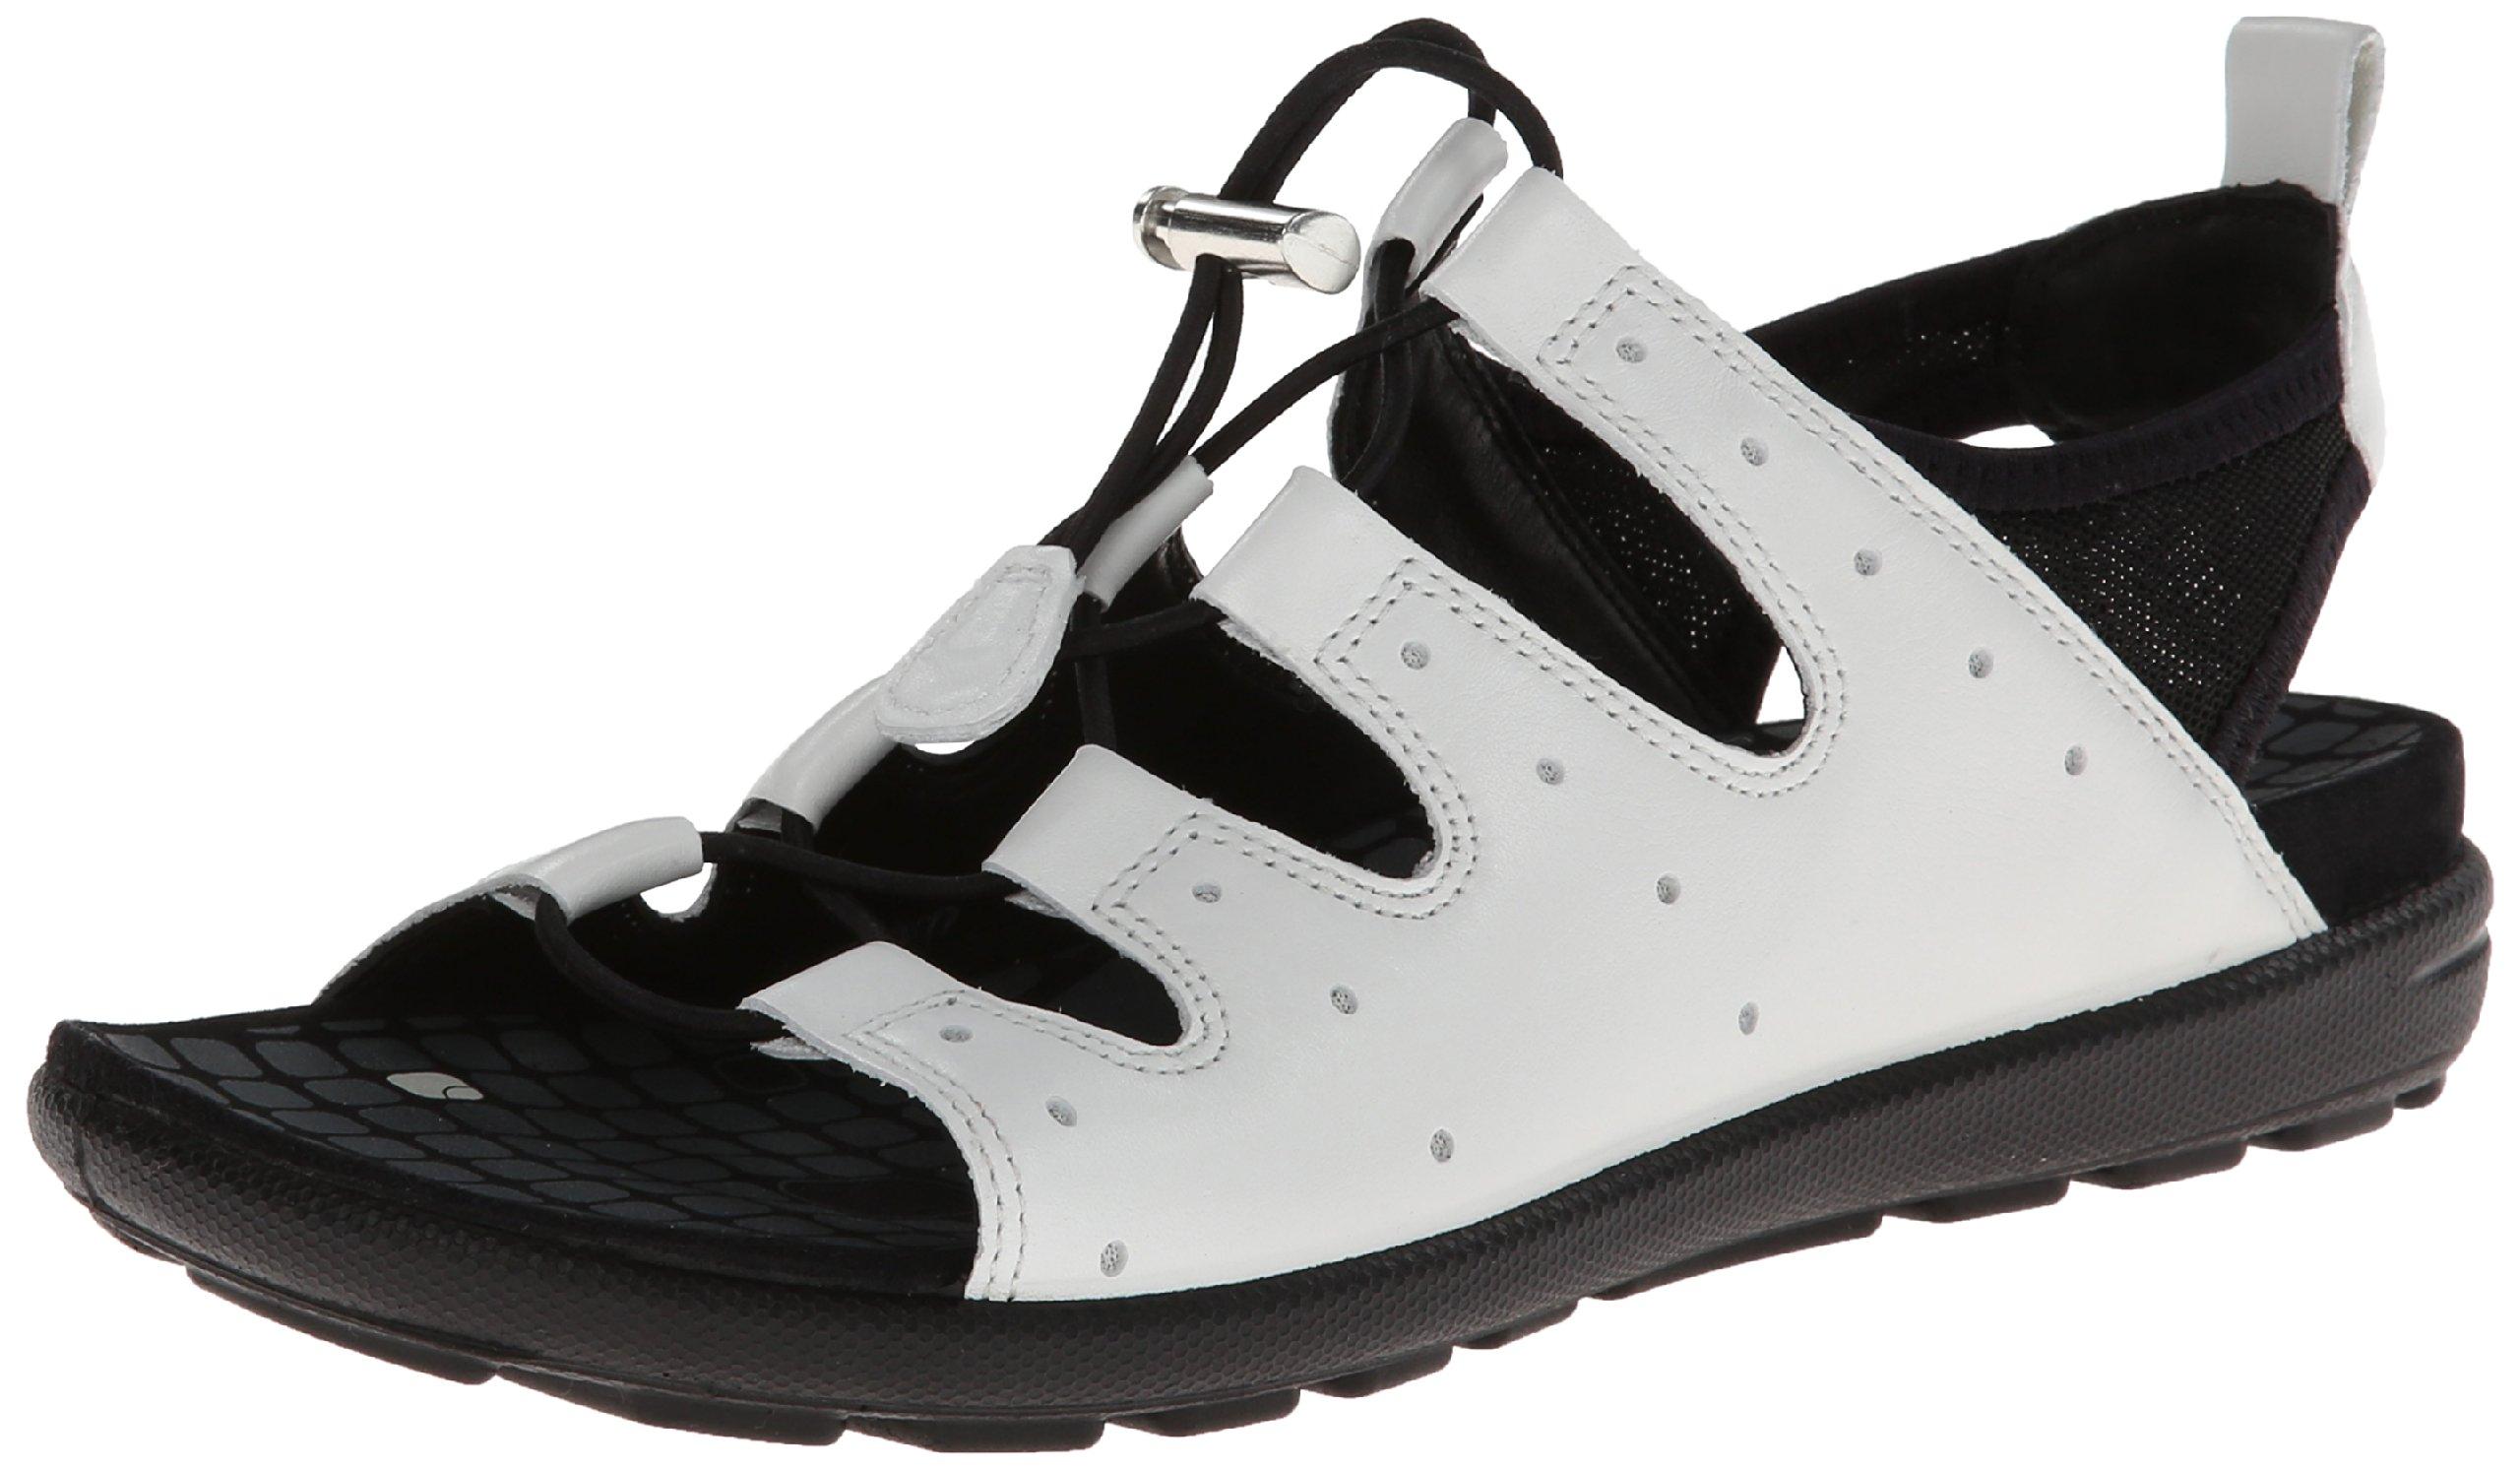 Ecco Footwear Womens Jab Toggle Gladiator Sandal, White/Black, 38 EU/7-7.5 M US